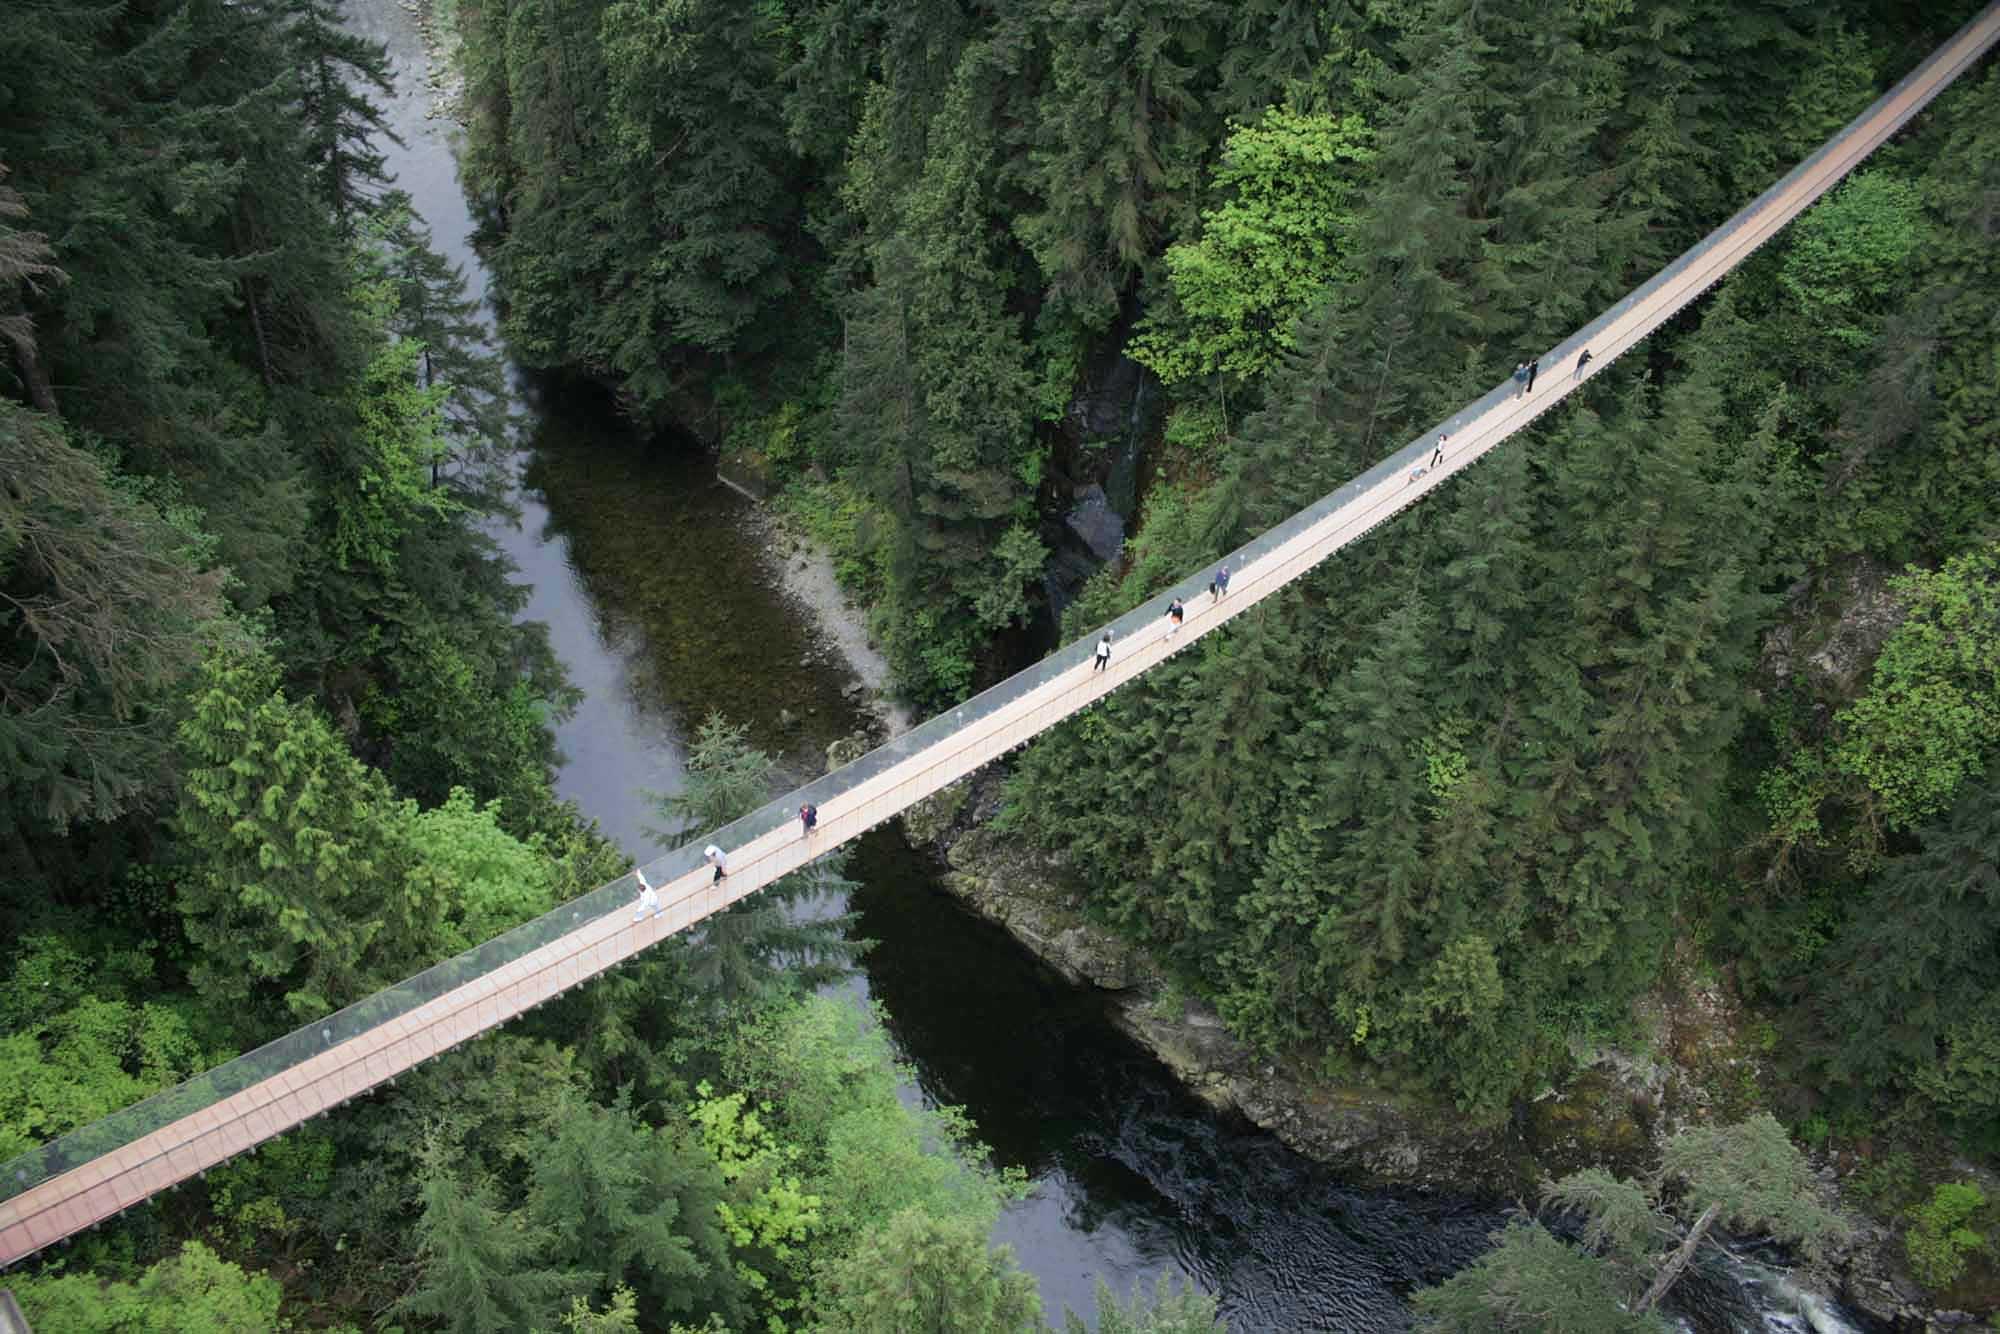 Visitors walk across the Capilano Suspension Bridge above the Capilano River and surrounding rainforest in Vancouver, BC.